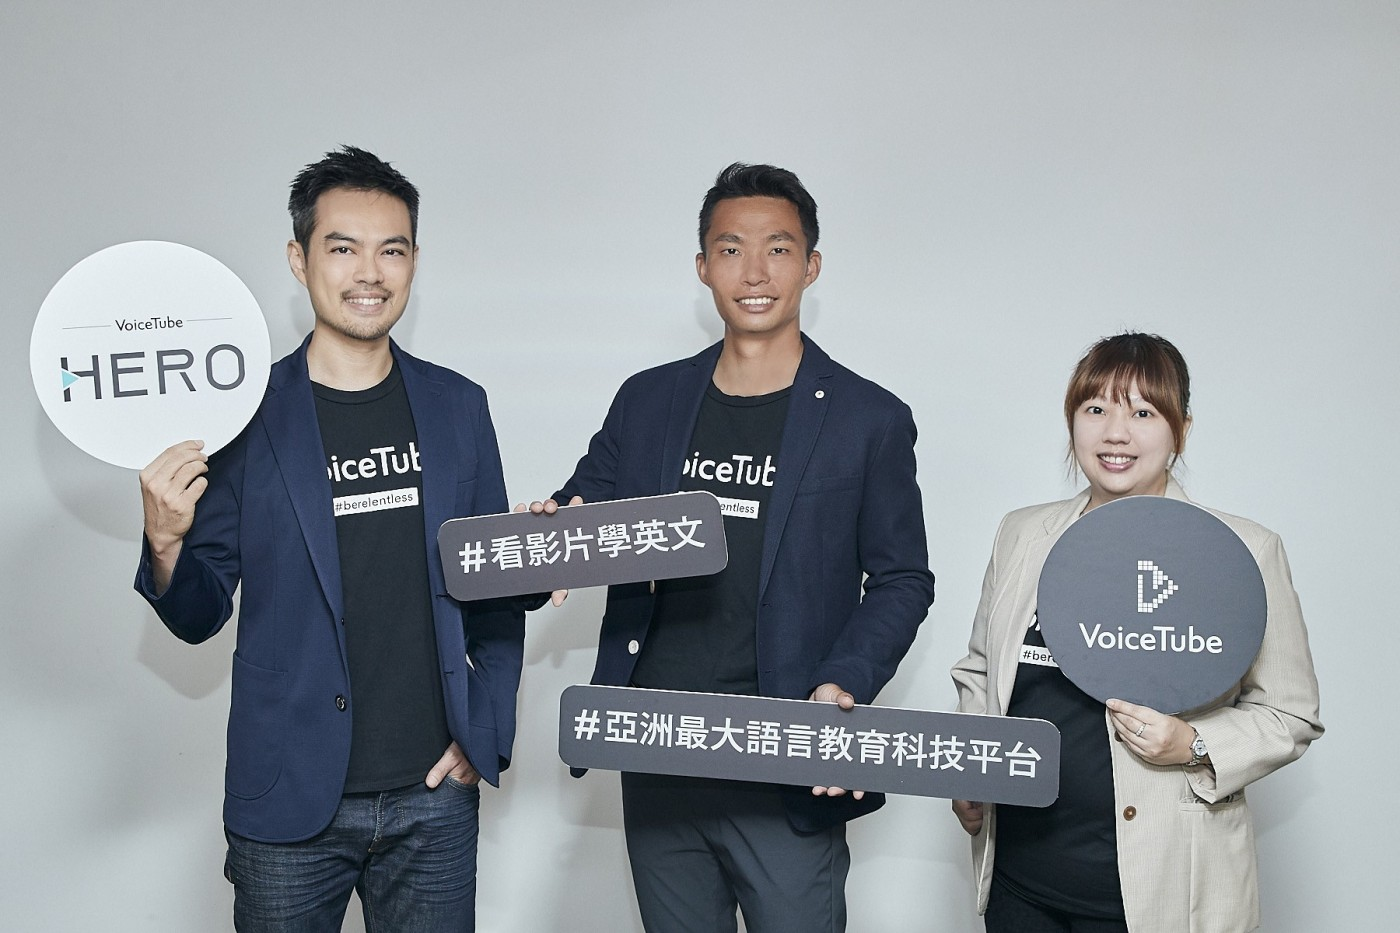 VoiceTube獲逾1億元A輪投資!插旗日本、越南,靠3步把英語學習市場拱大